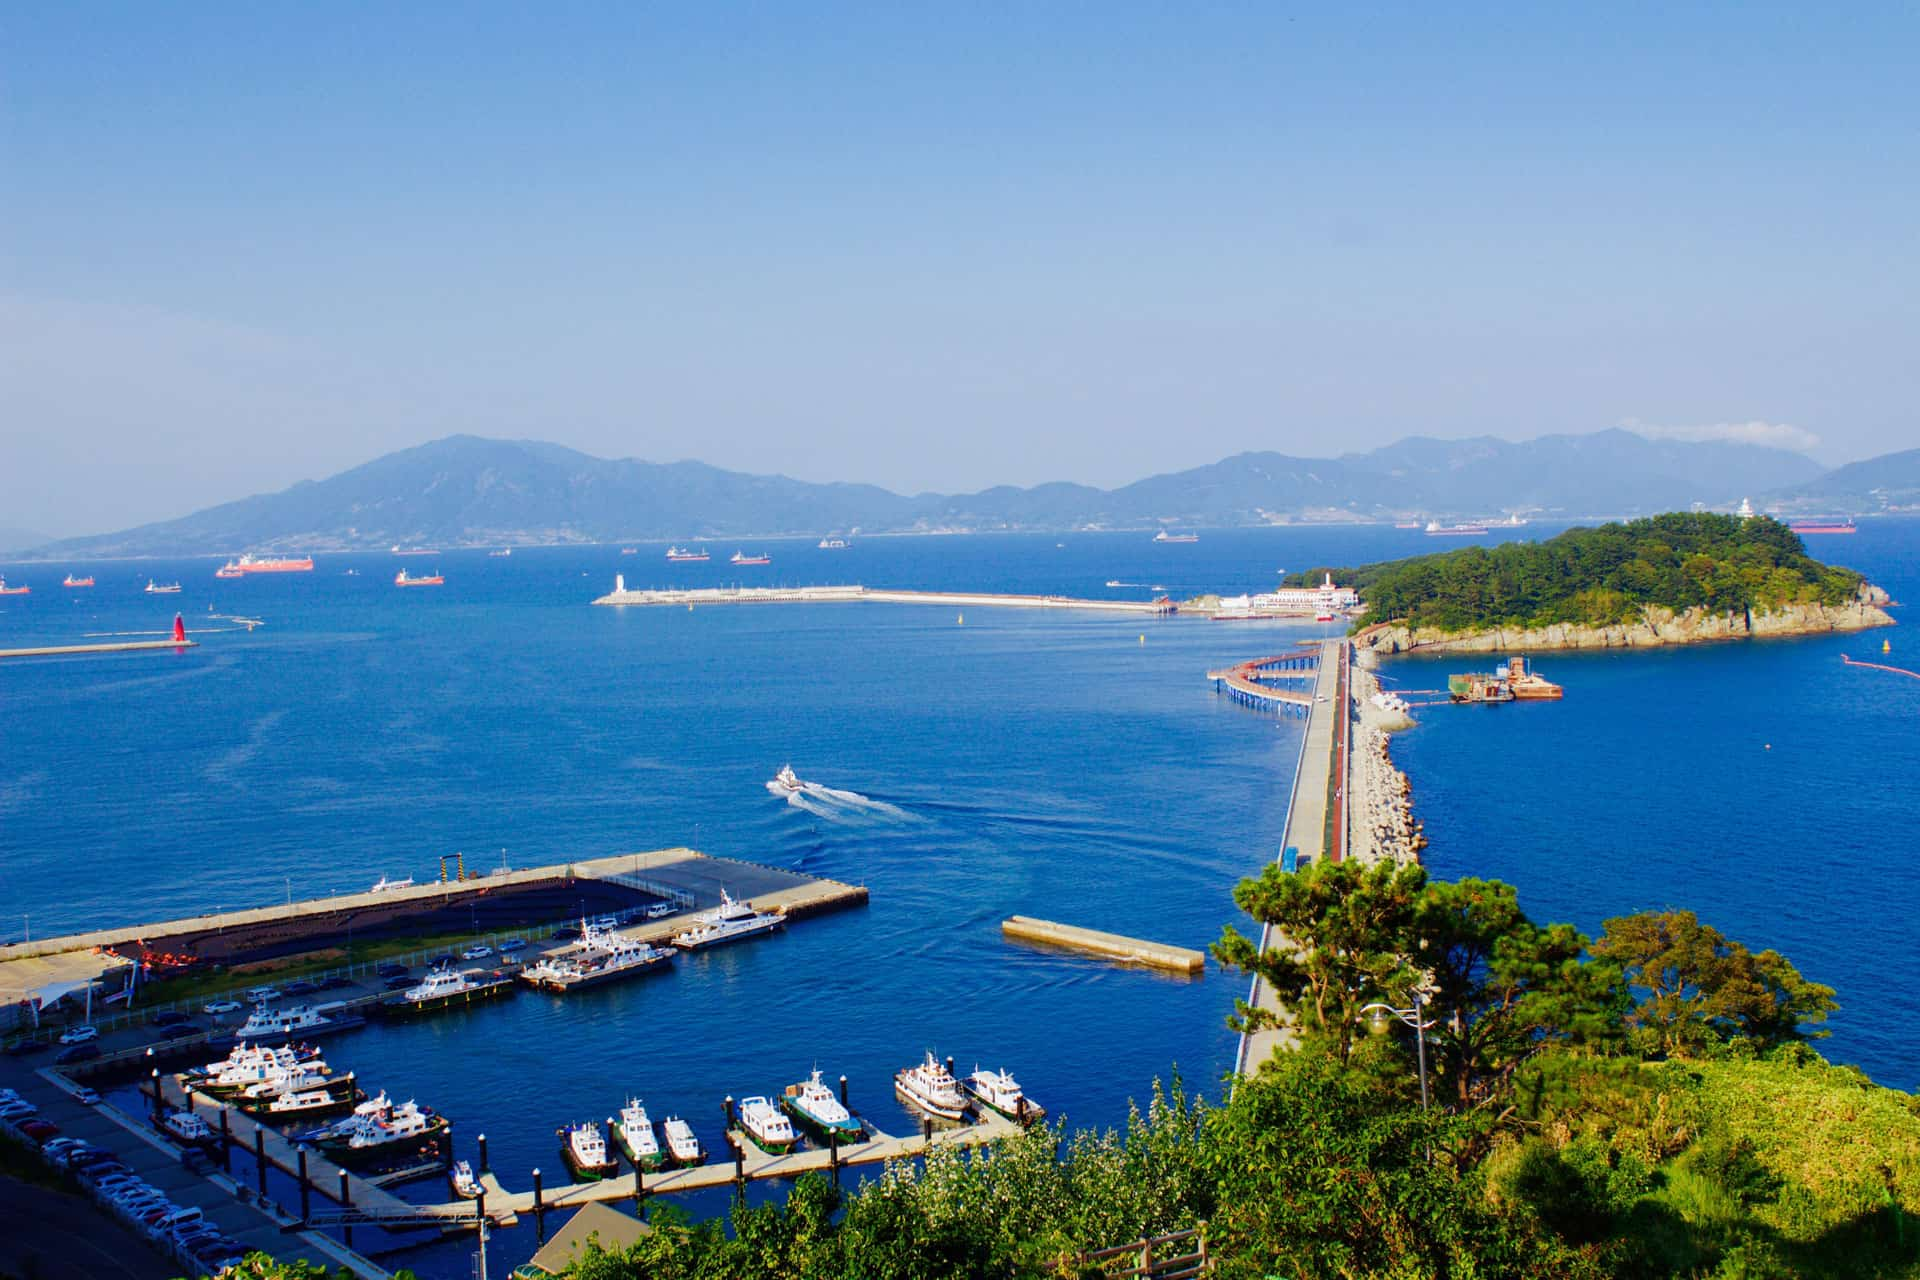 Odongdo Island Yeosu South Korea